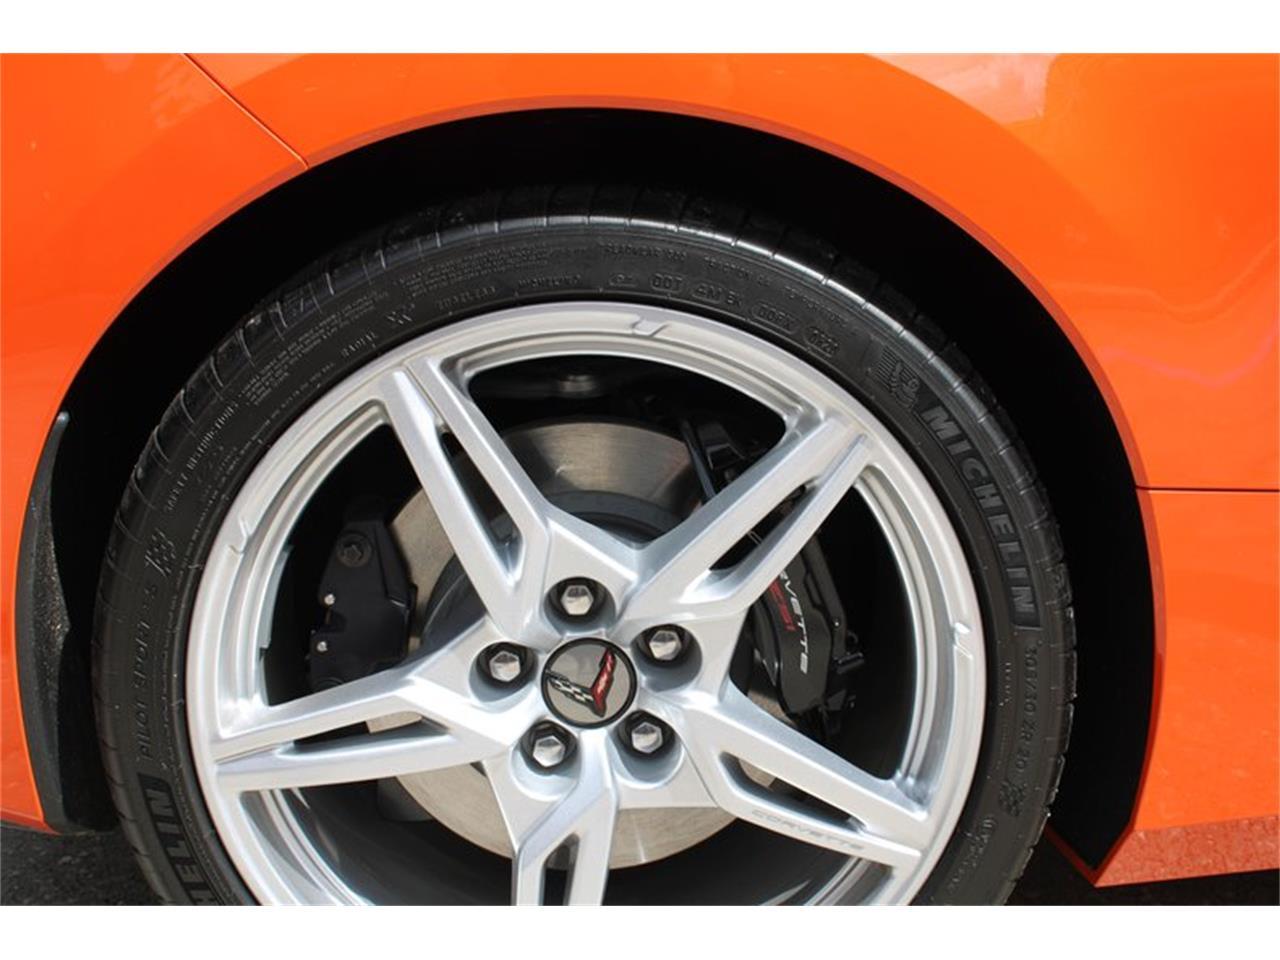 2020 Chevrolet Corvette (CC-1412184) for sale in Sarasota, Florida